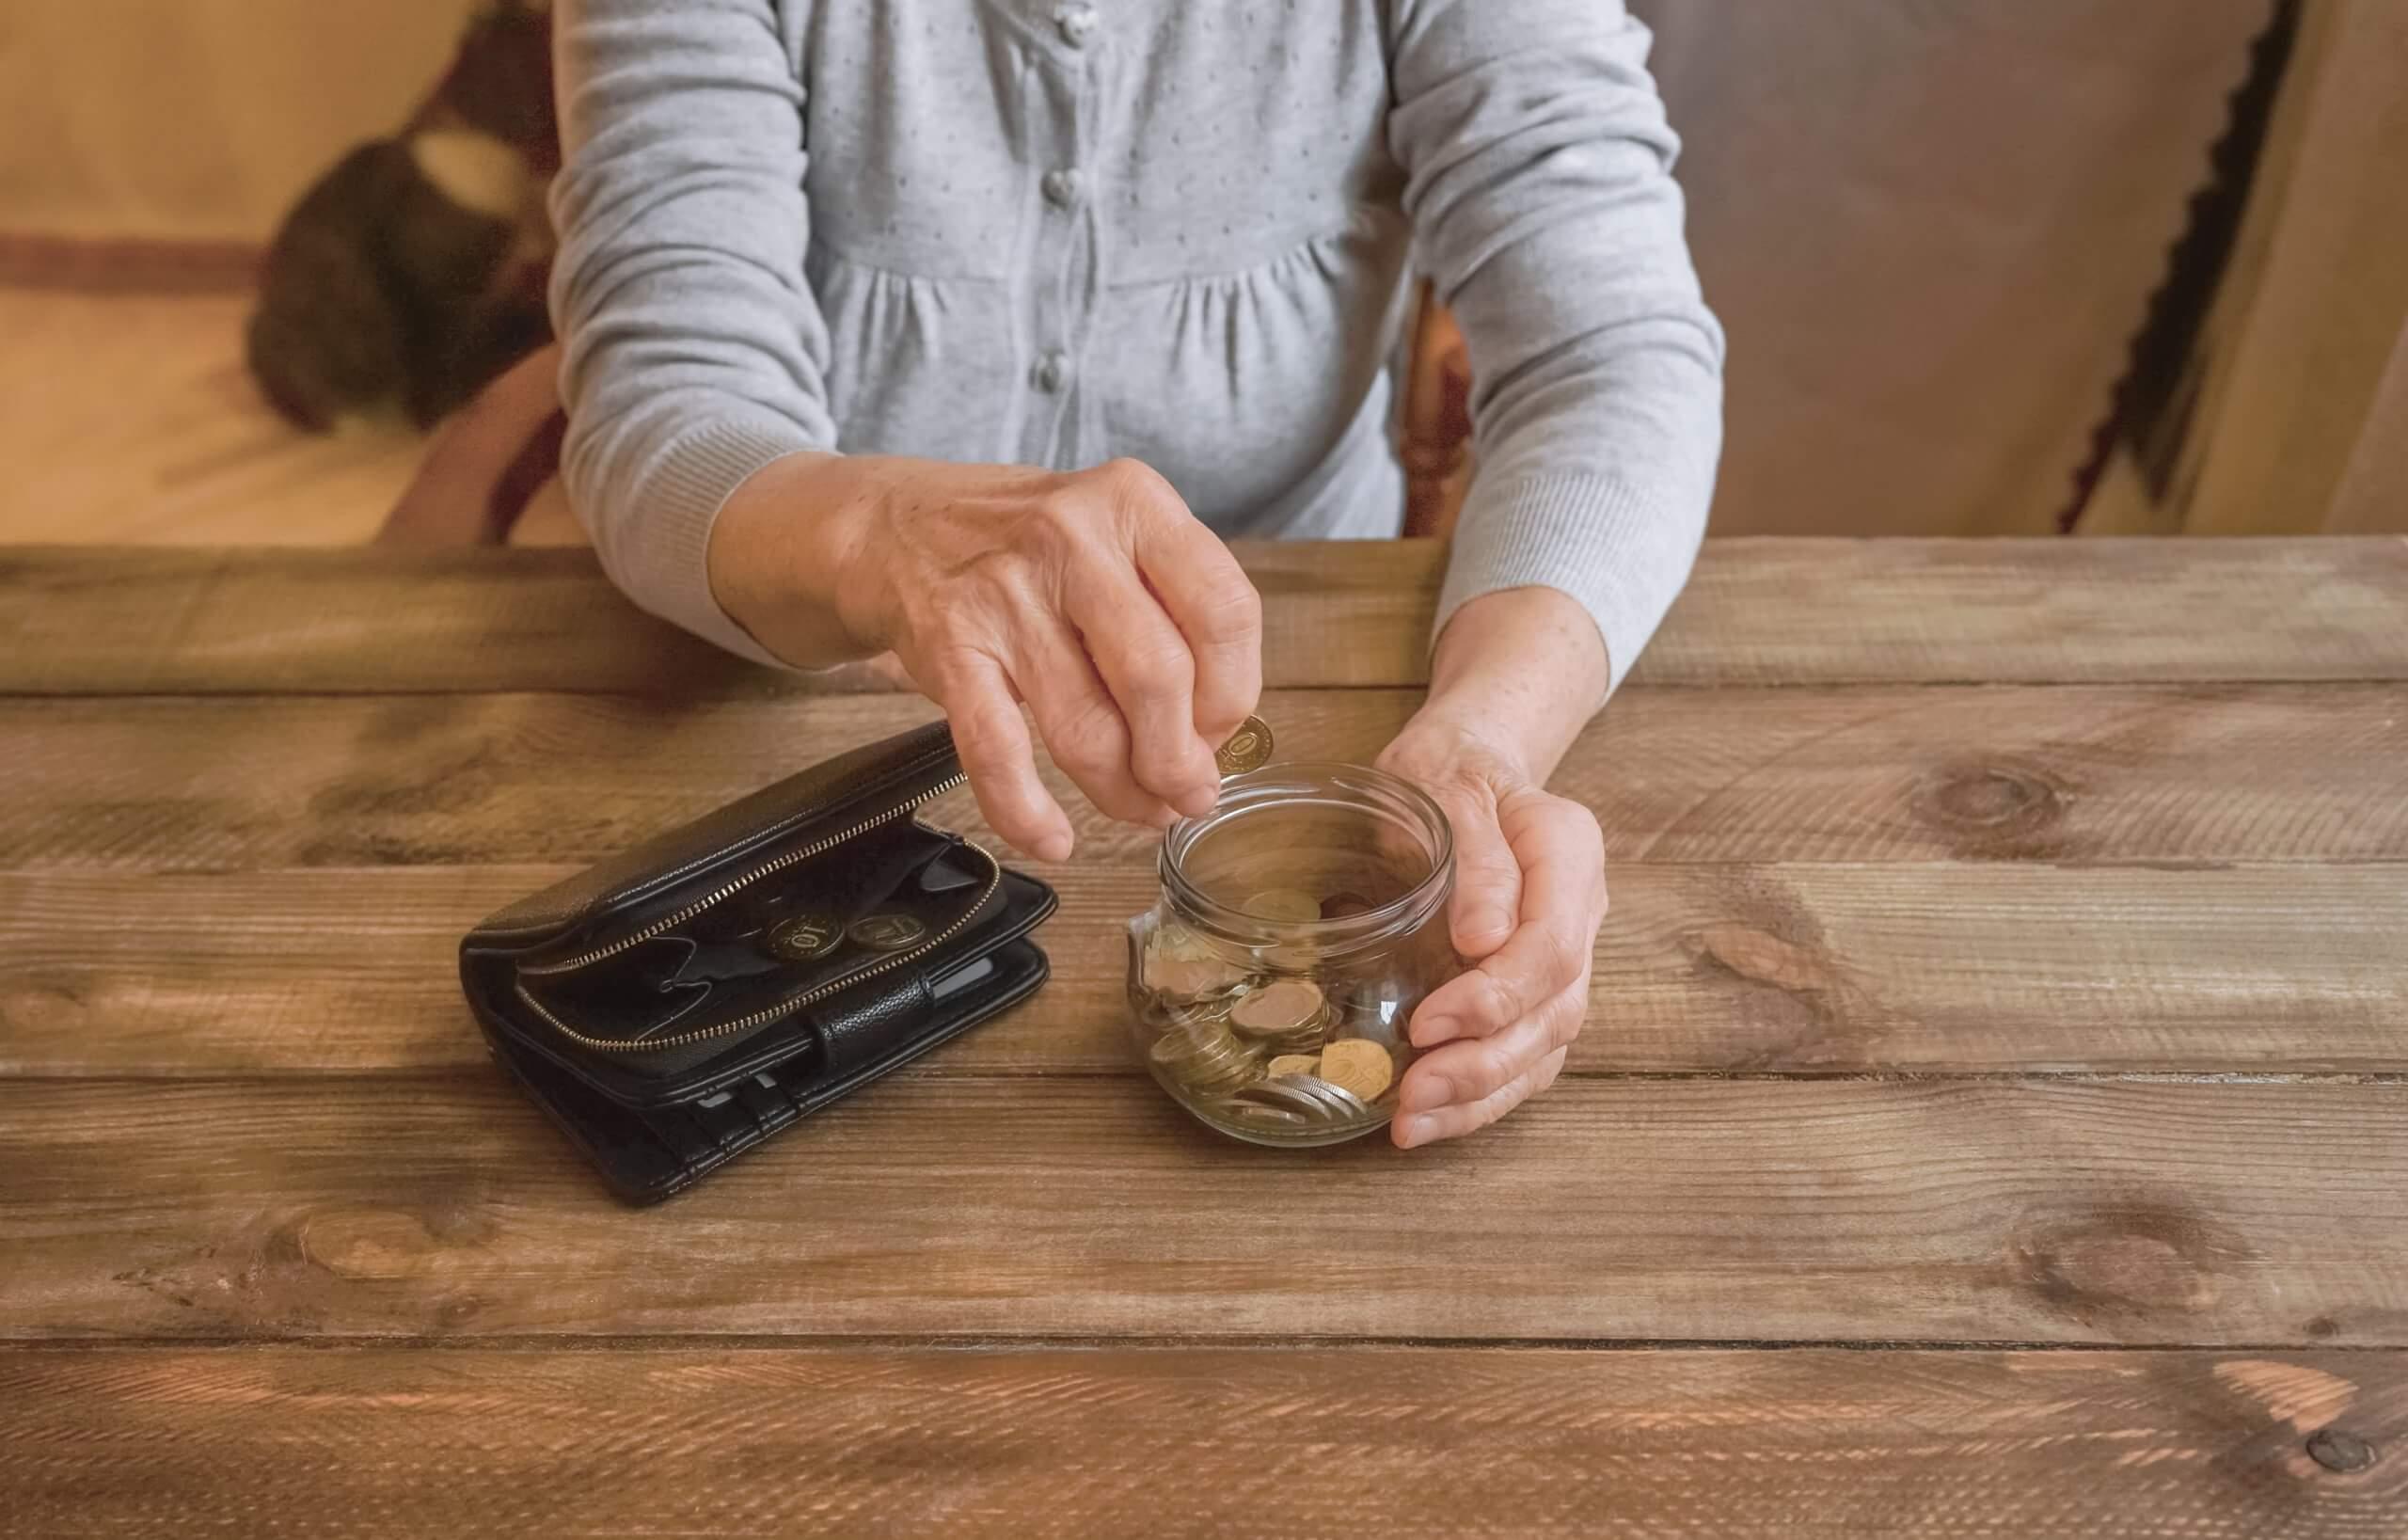 Elderly hands placing coins in a jar